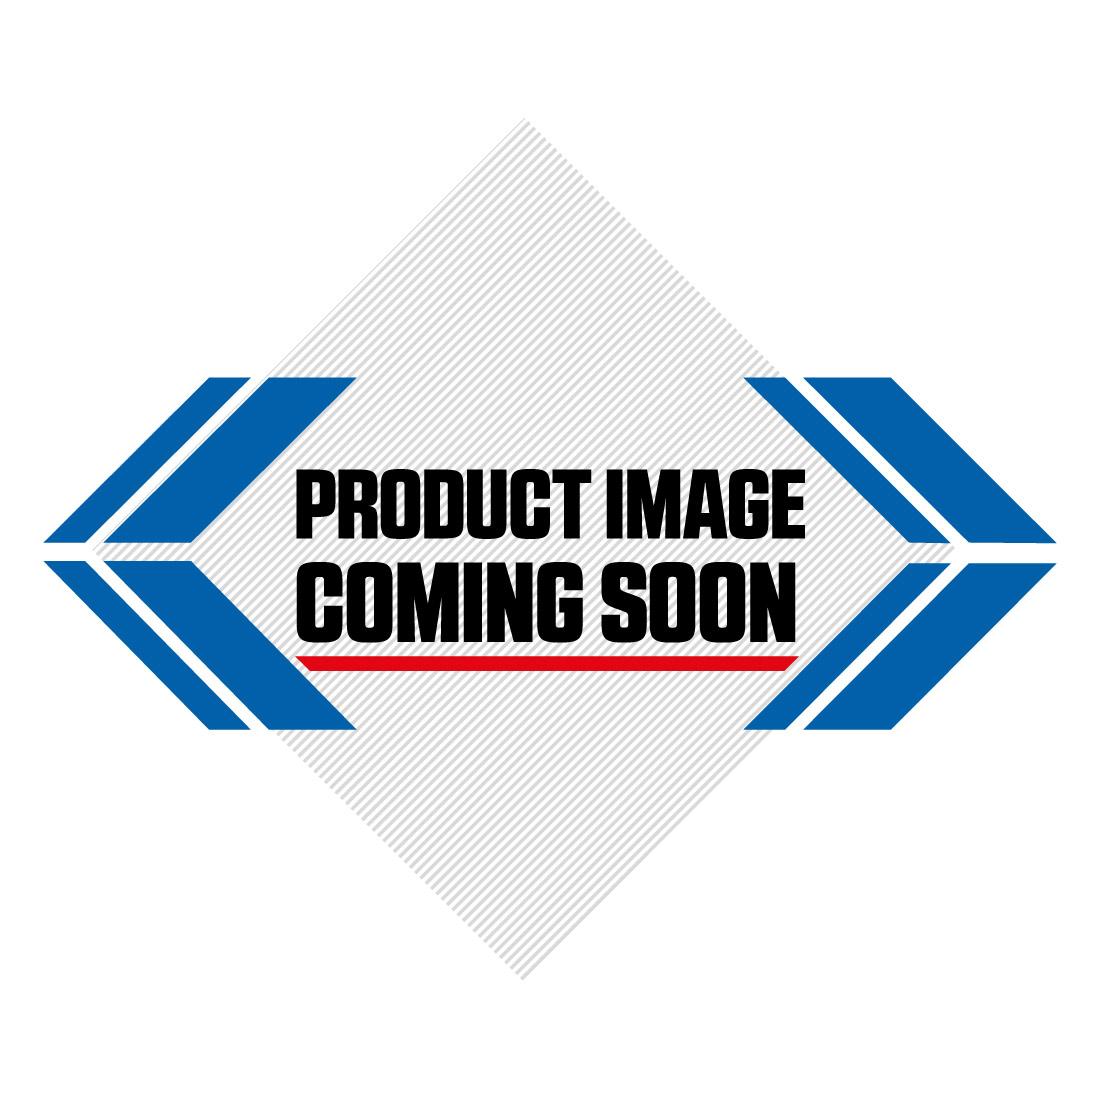 Suzuki Restyled Plastic Kit Suzuki RM 85 (00-17) Black Image-4